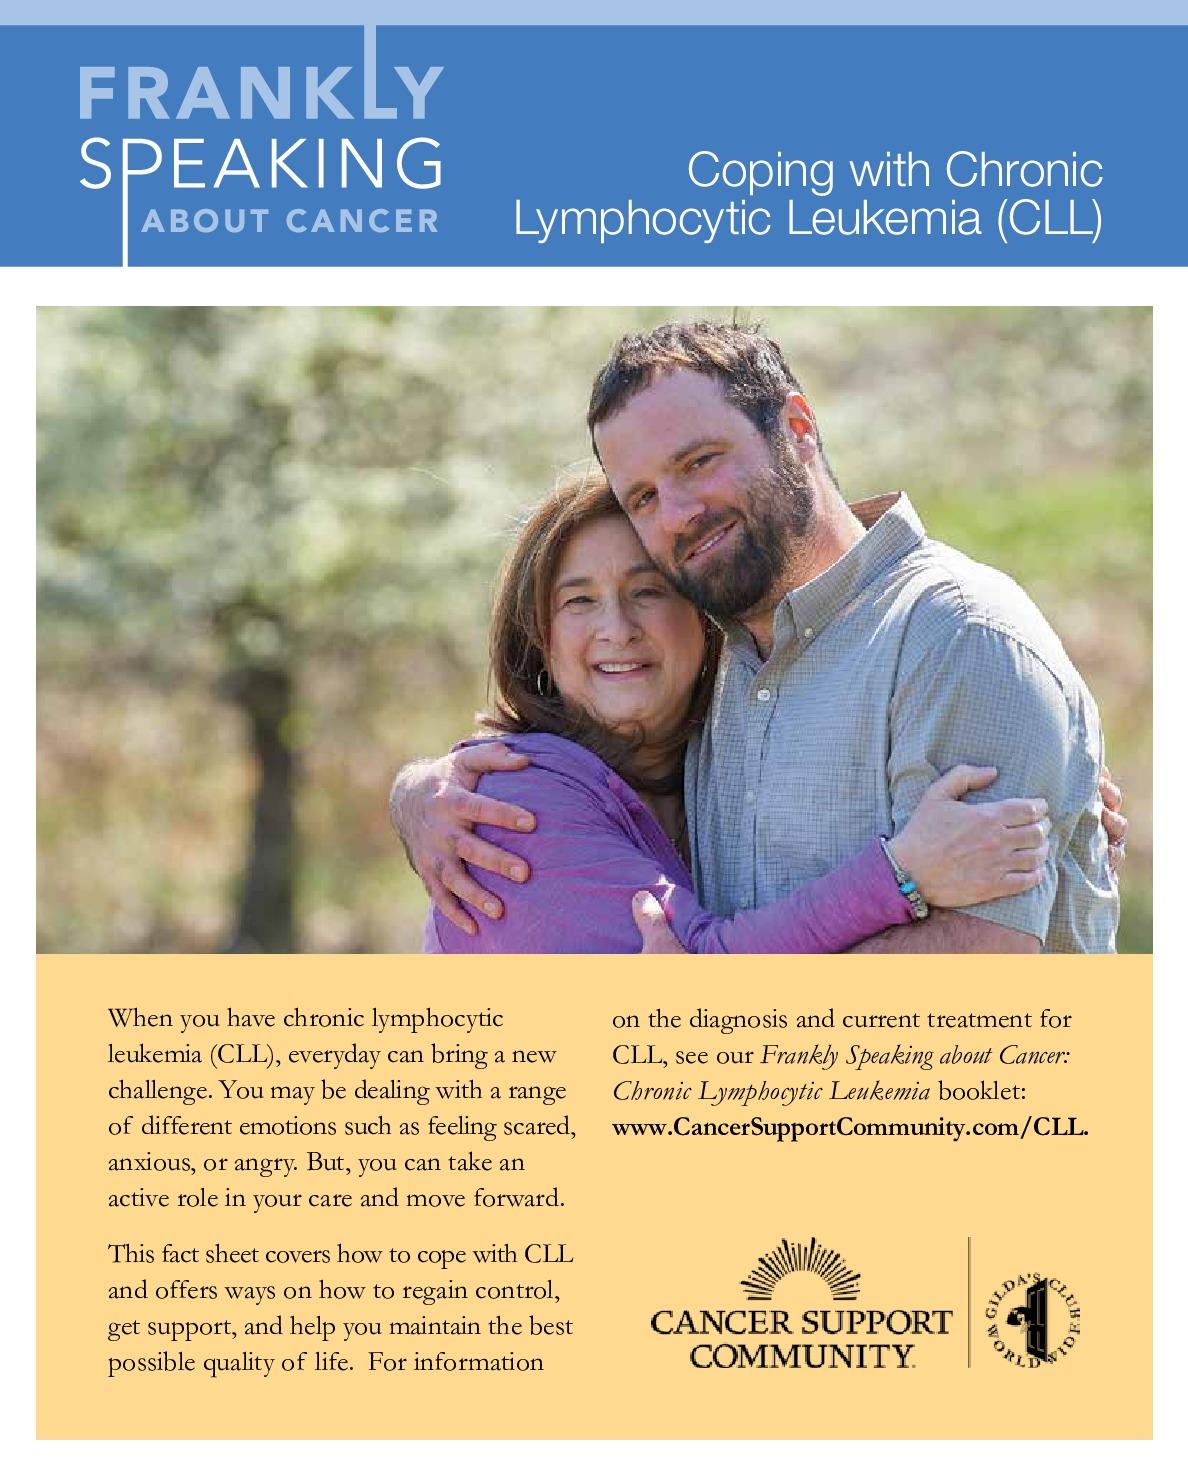 FSAC Coping with Chronic Lymphocytic Leukemia (CLL)